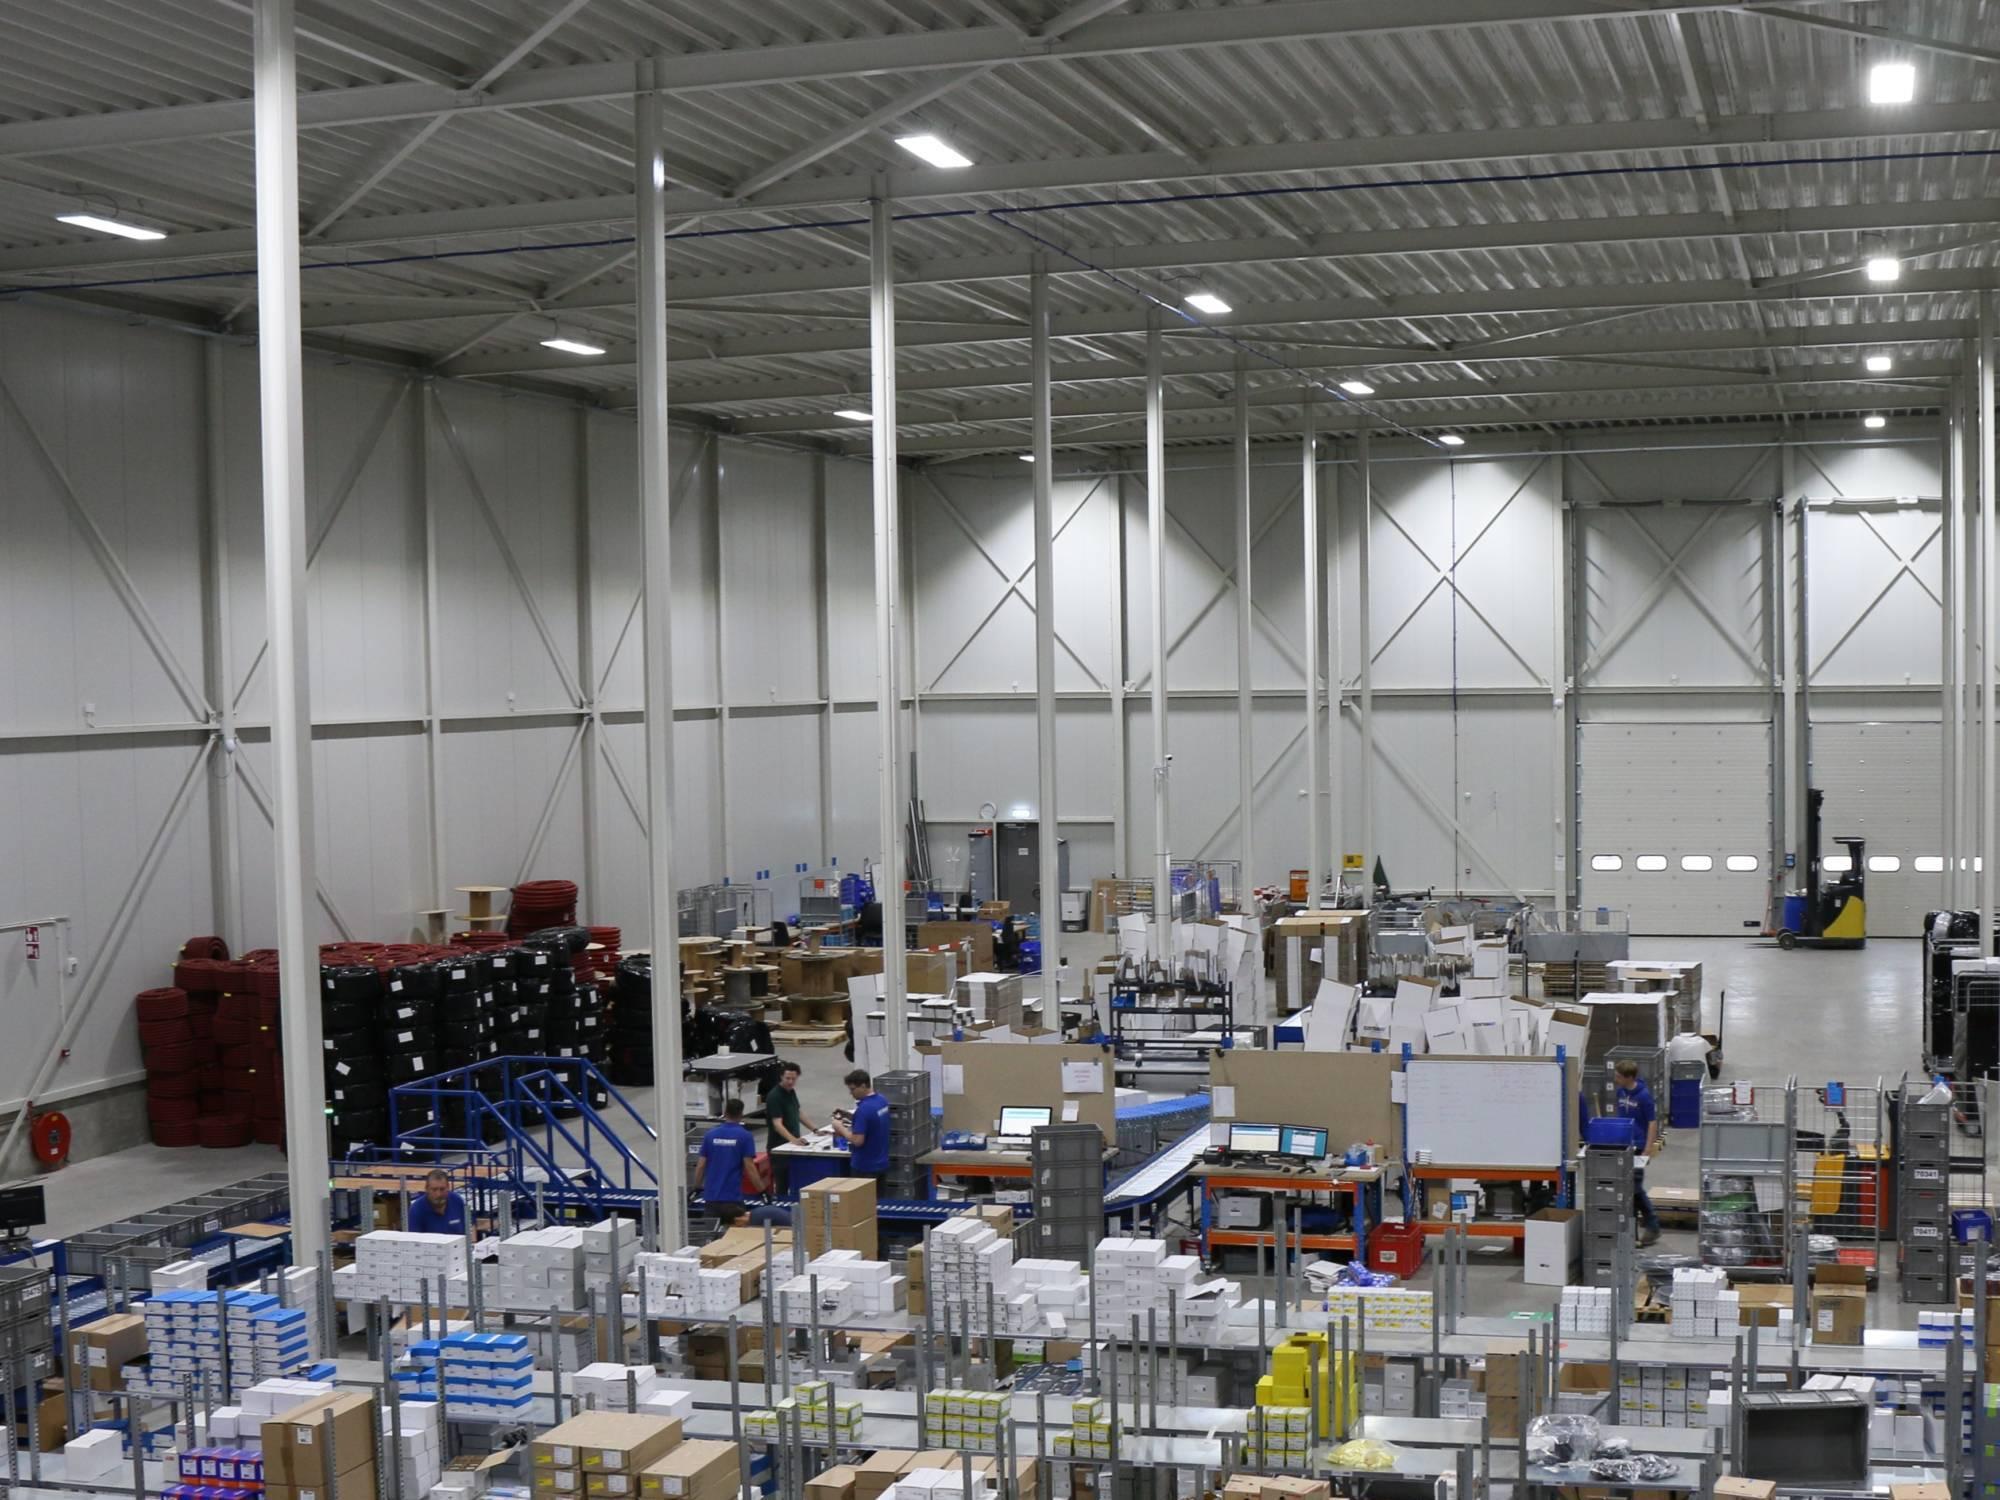 Nachhaltige LED-Beleuchtung Verpackungsindustrie